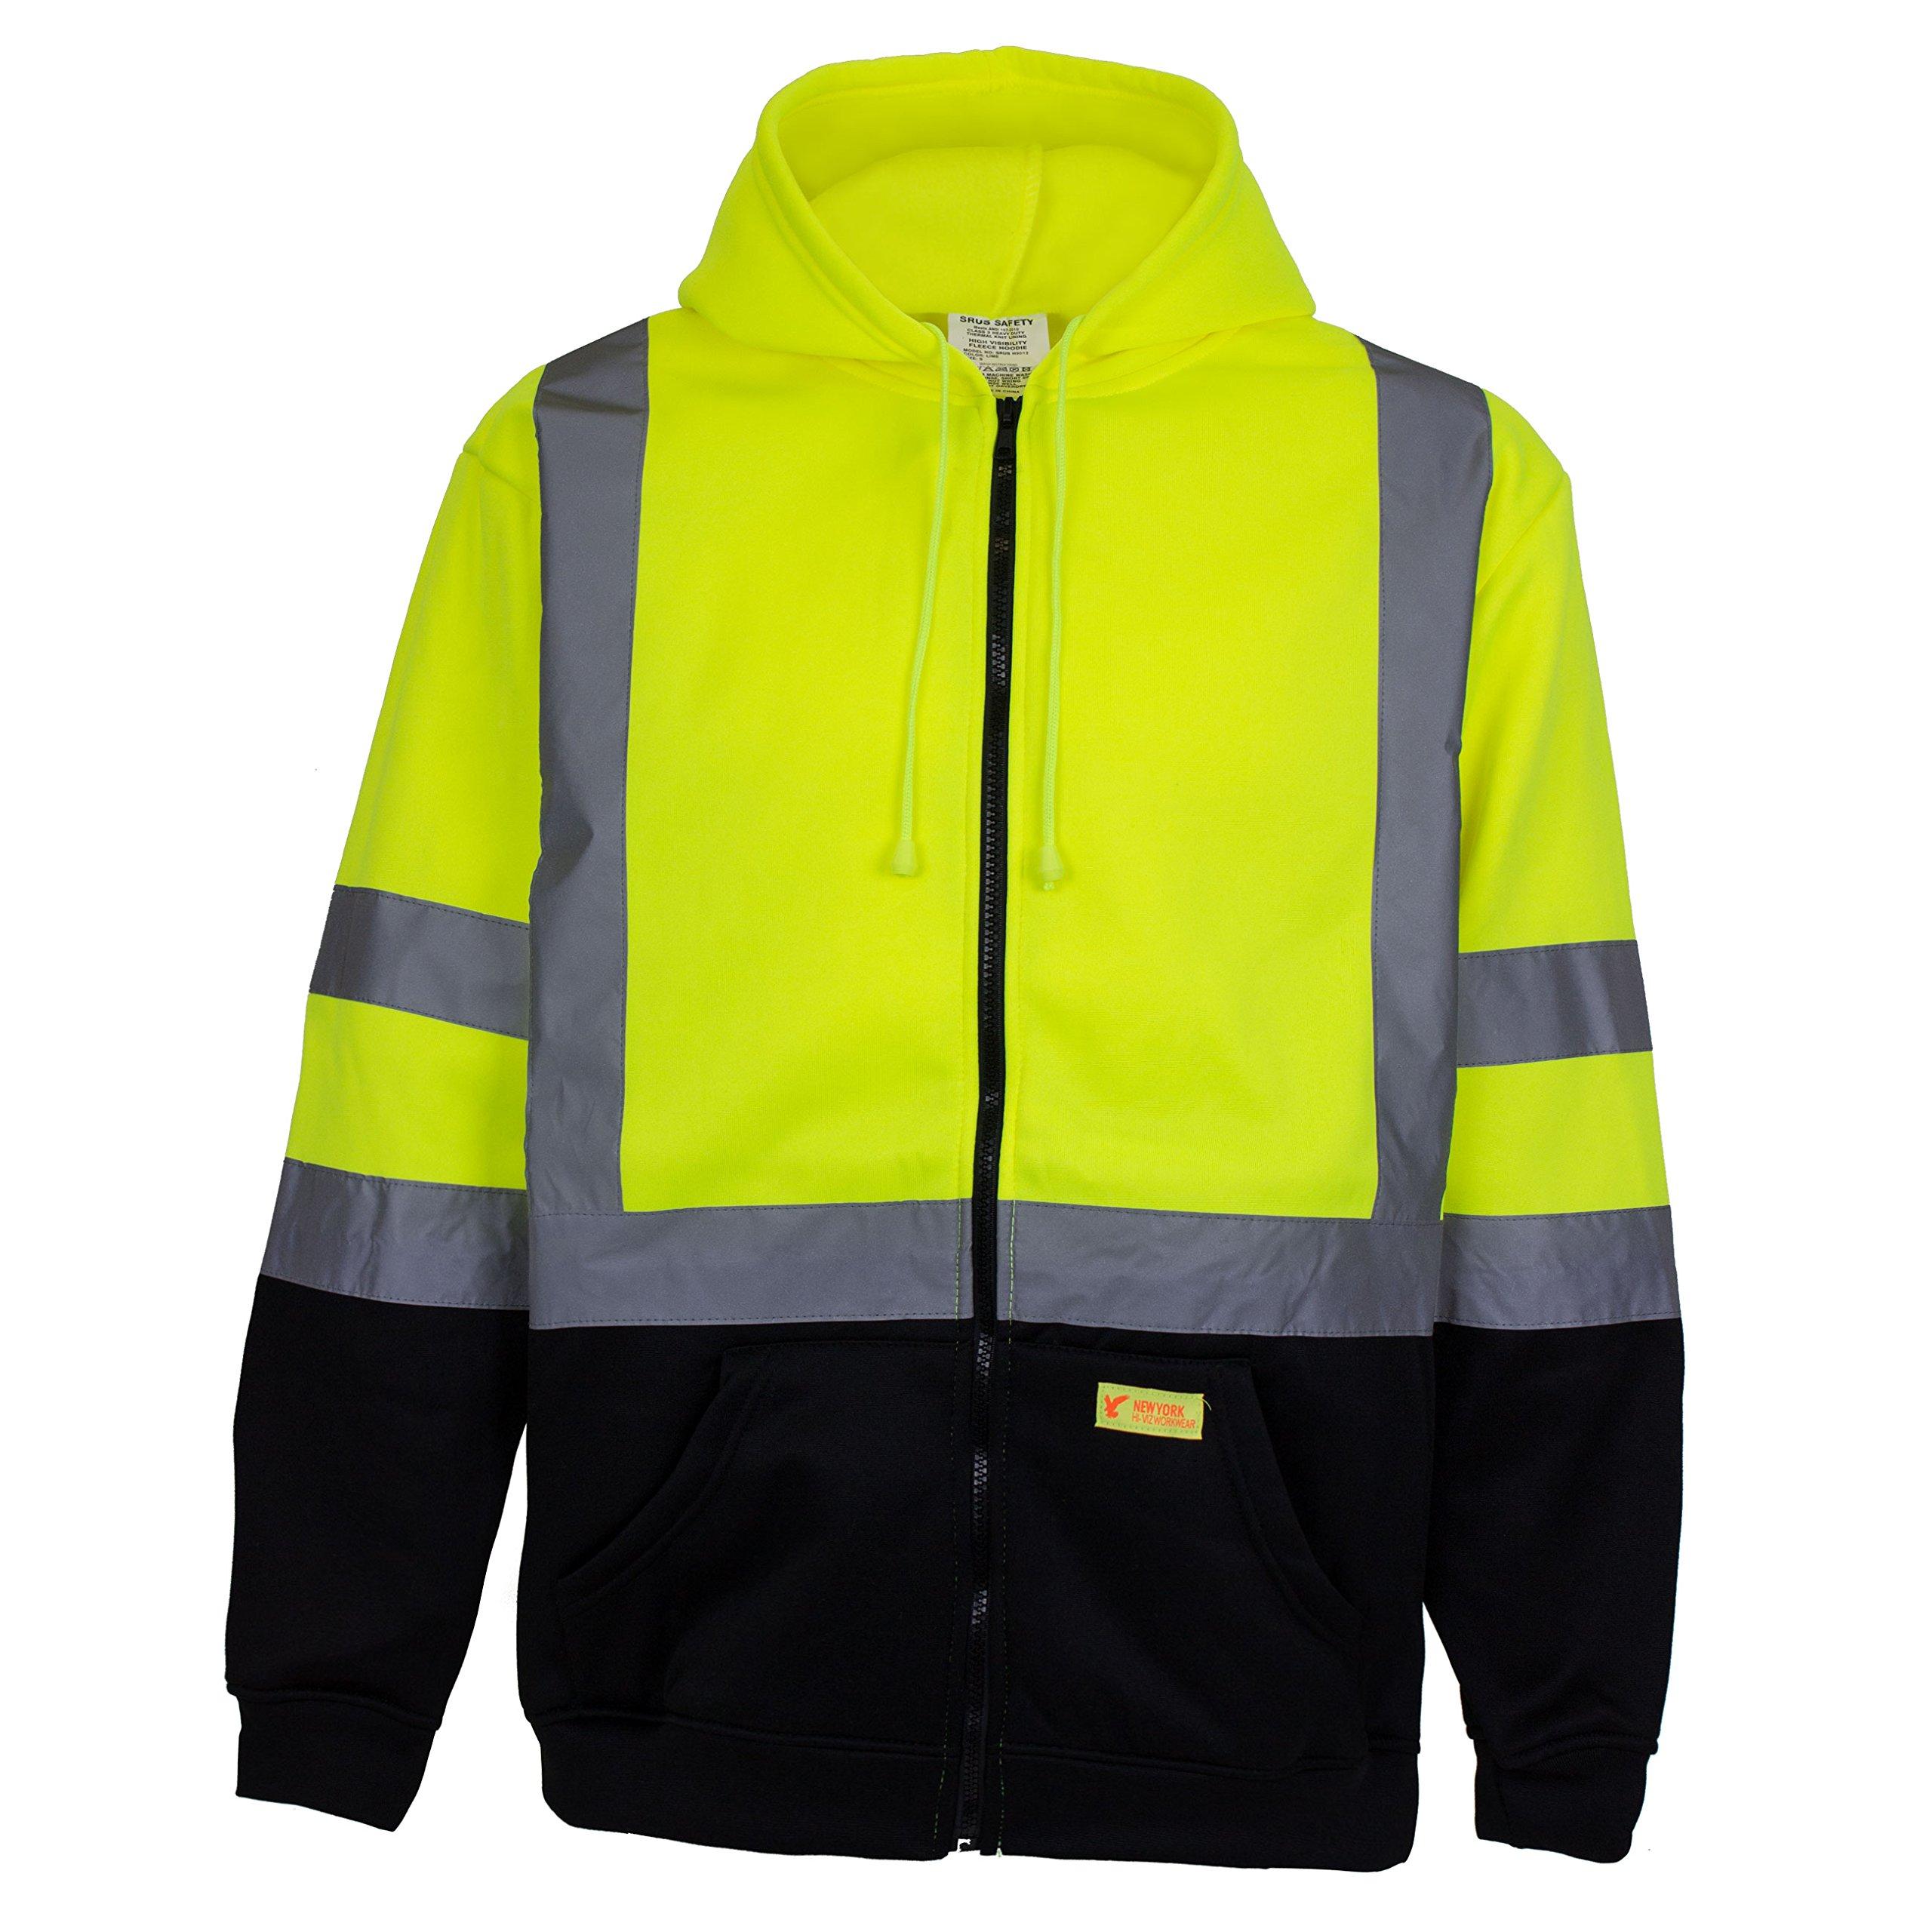 New York Hi-Viz Workwear H9012 Men's ANSI Class 3 High Visibility Class 3 Sweatshirt, Full Zip Hooded, Lightweight, Black Bottom (XX-Large) by New York Hi-Viz Workwear (Image #2)